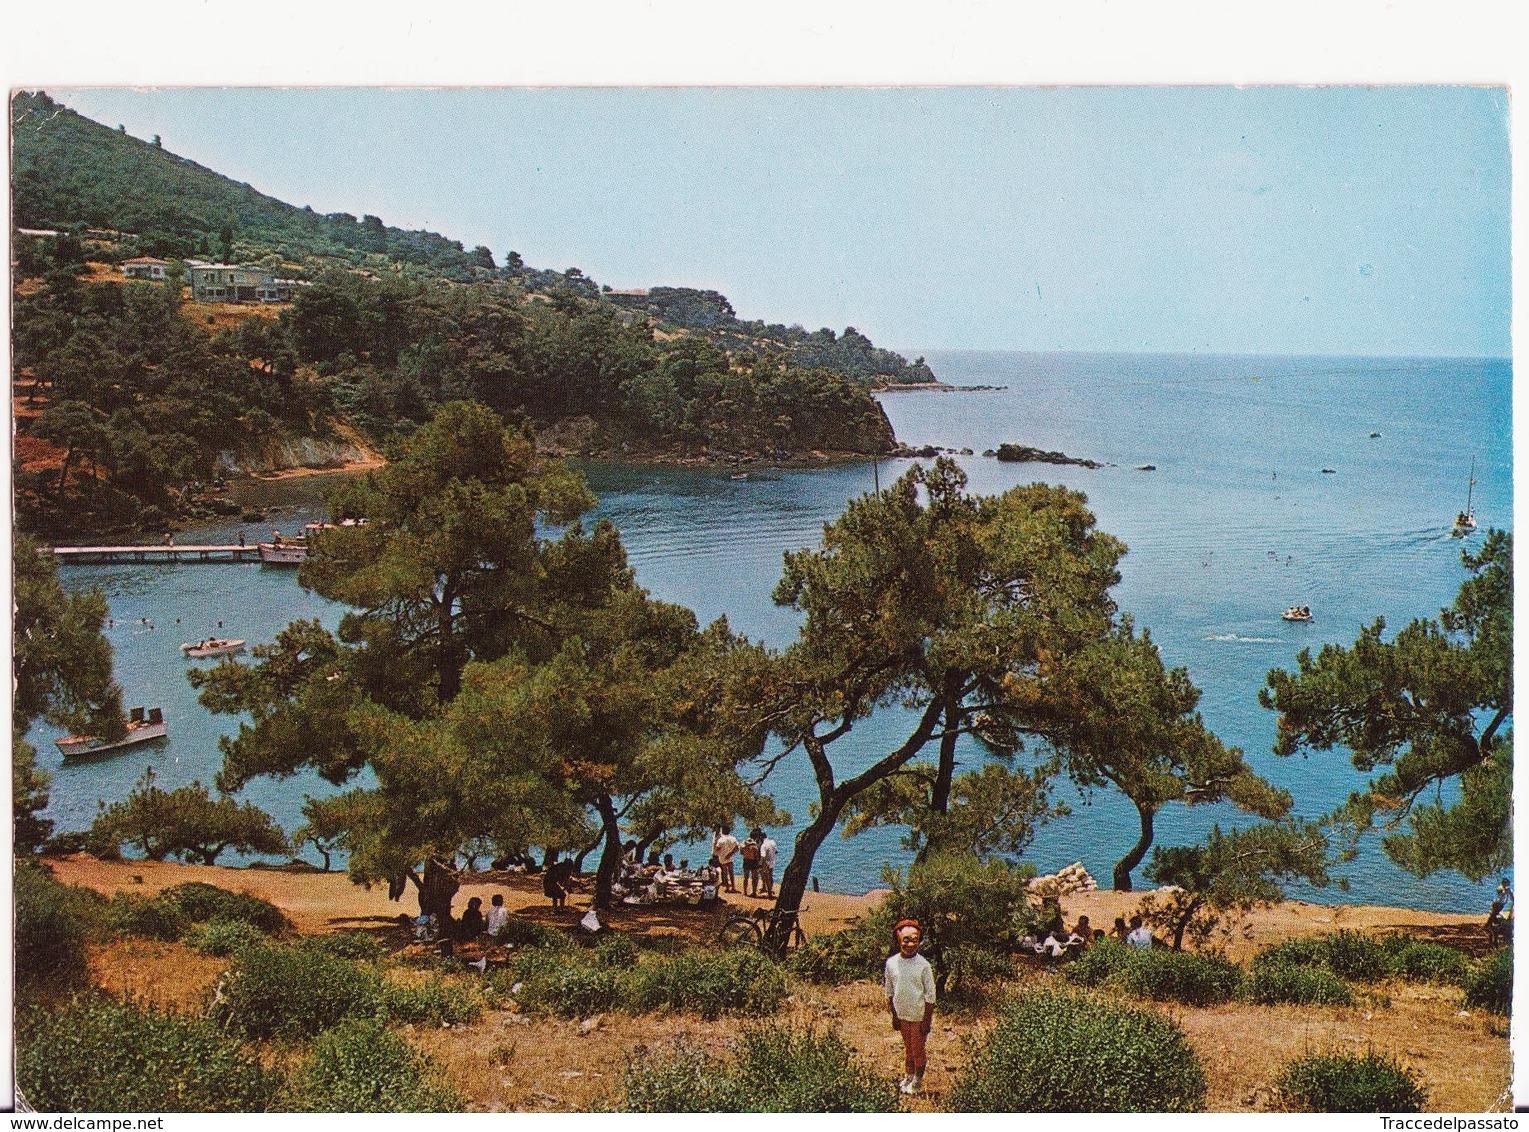 CARTOLINA ISTANBUL Ve INCILERI - TURCHIA - BUYUKADA - YORUKALI THE PRINCES ISLANDS - '70 - Turchia